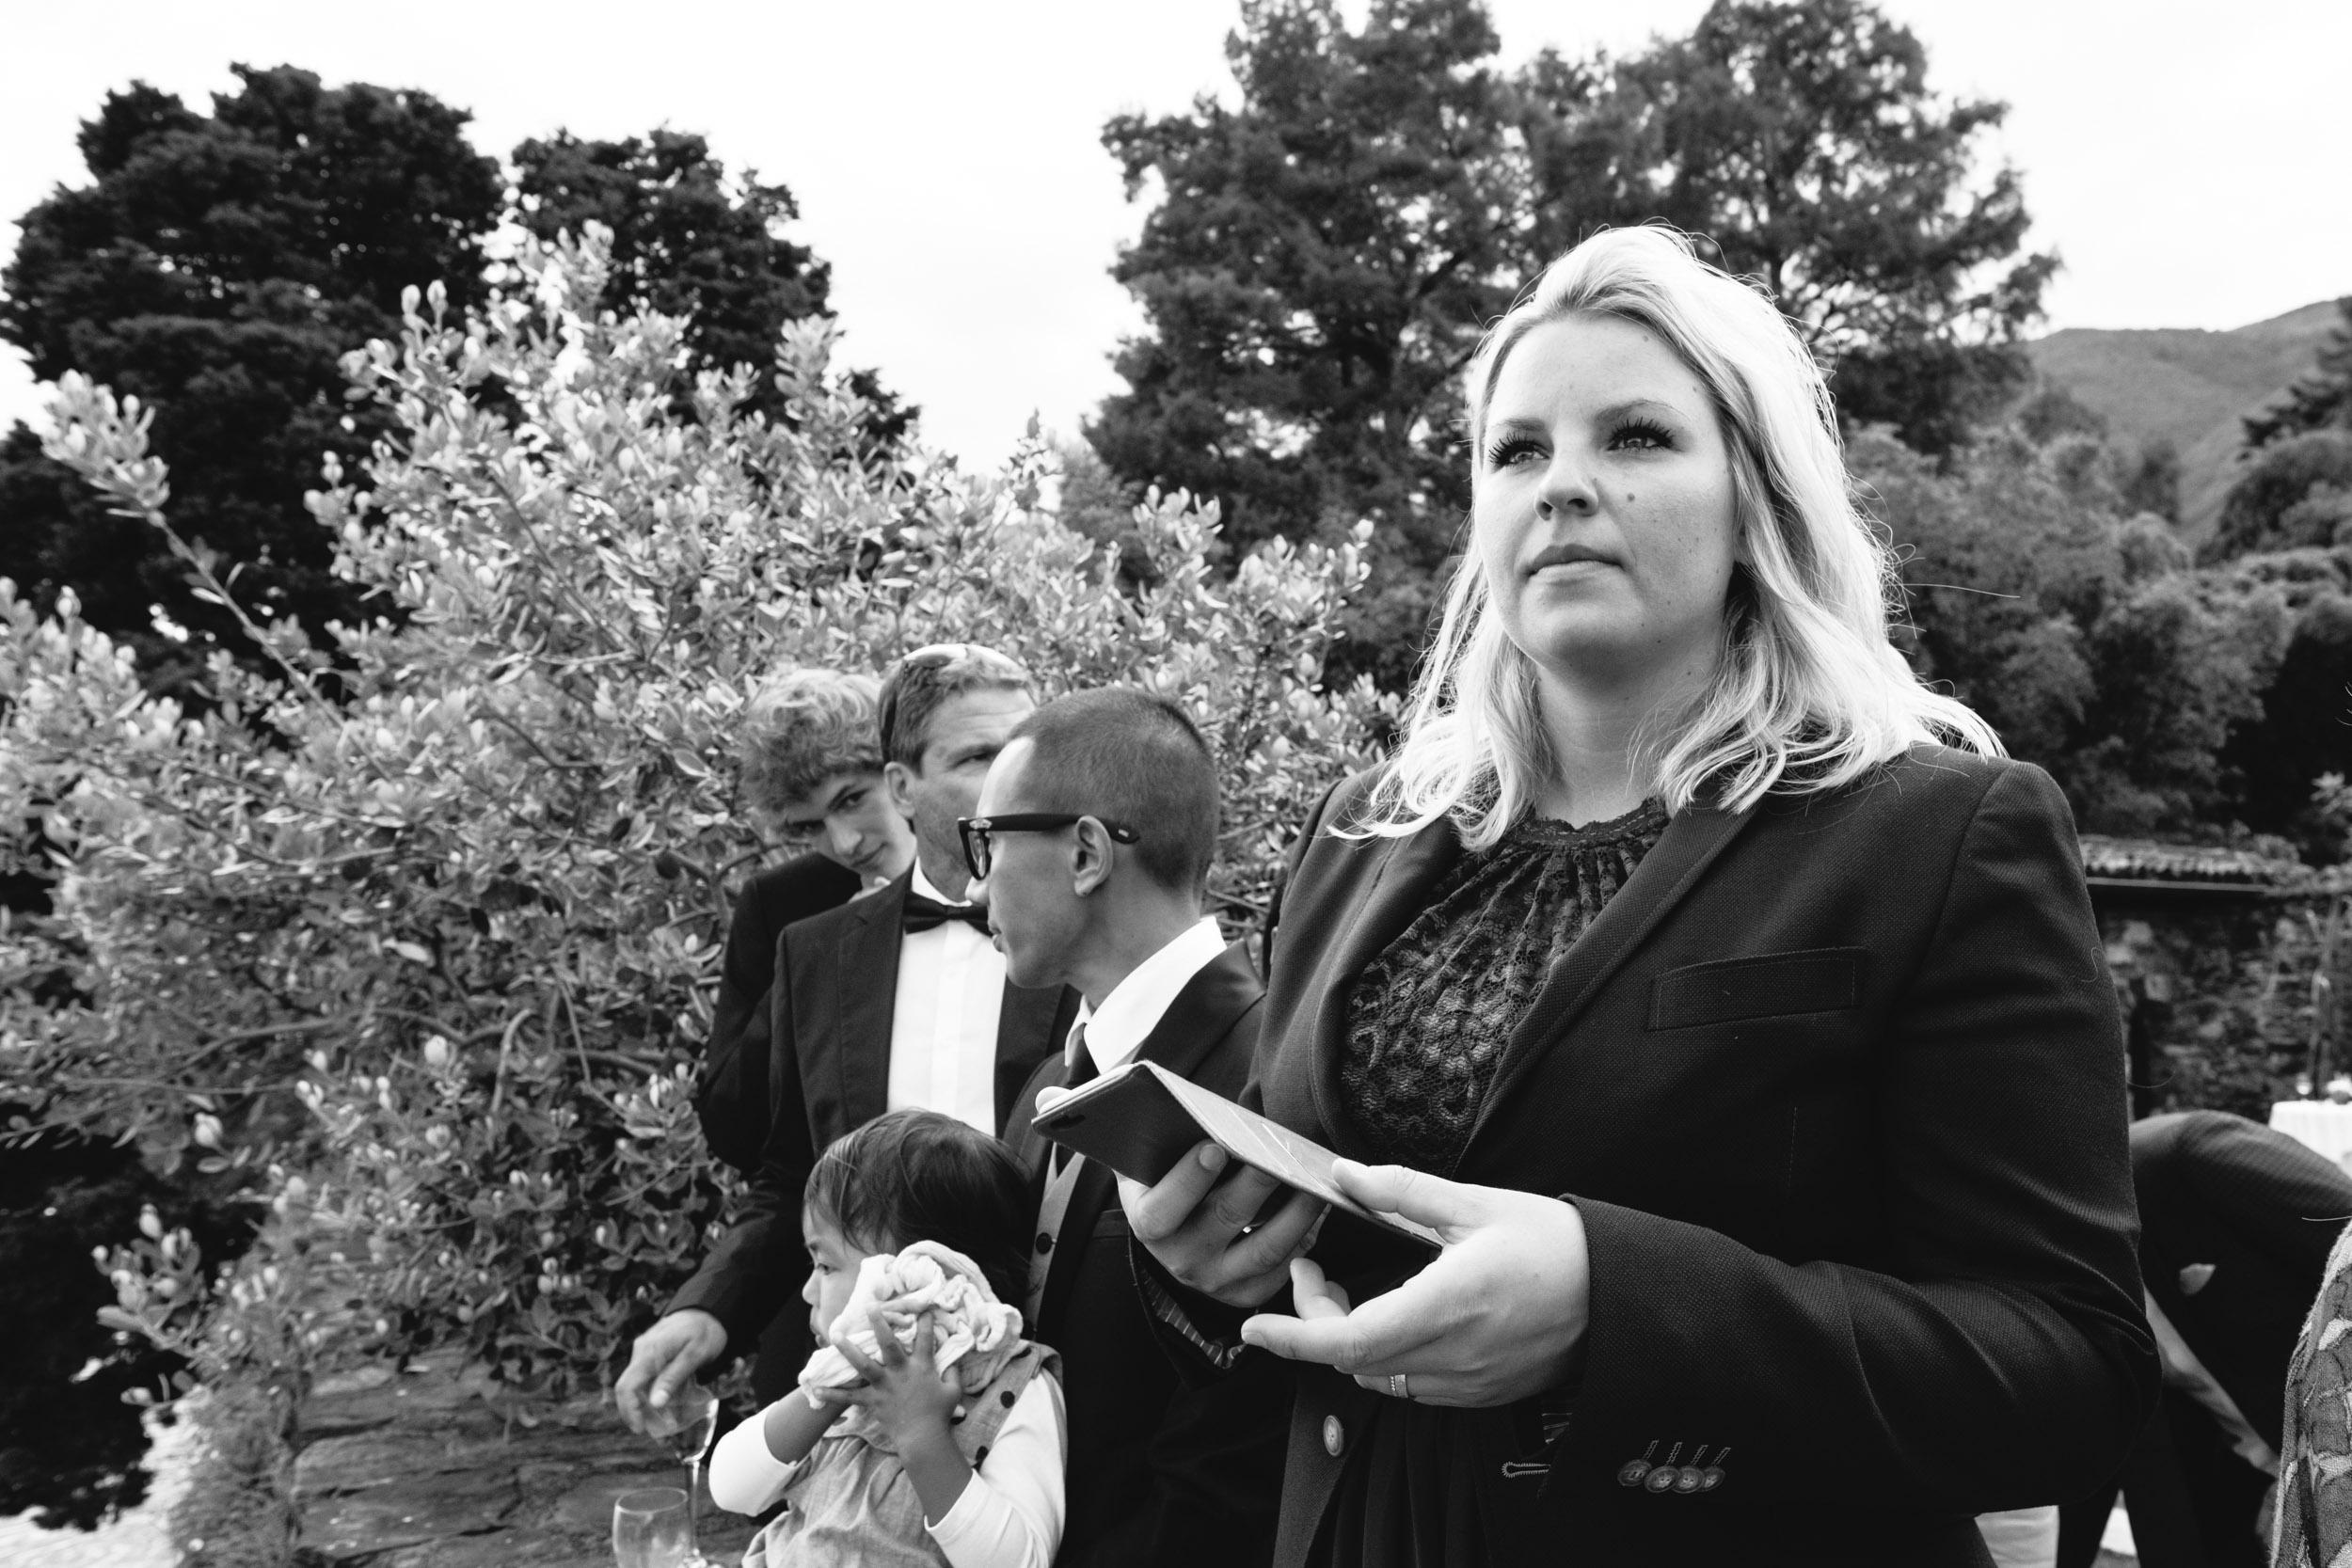 olivia-andreas-wedding-switzerland-372.jpg